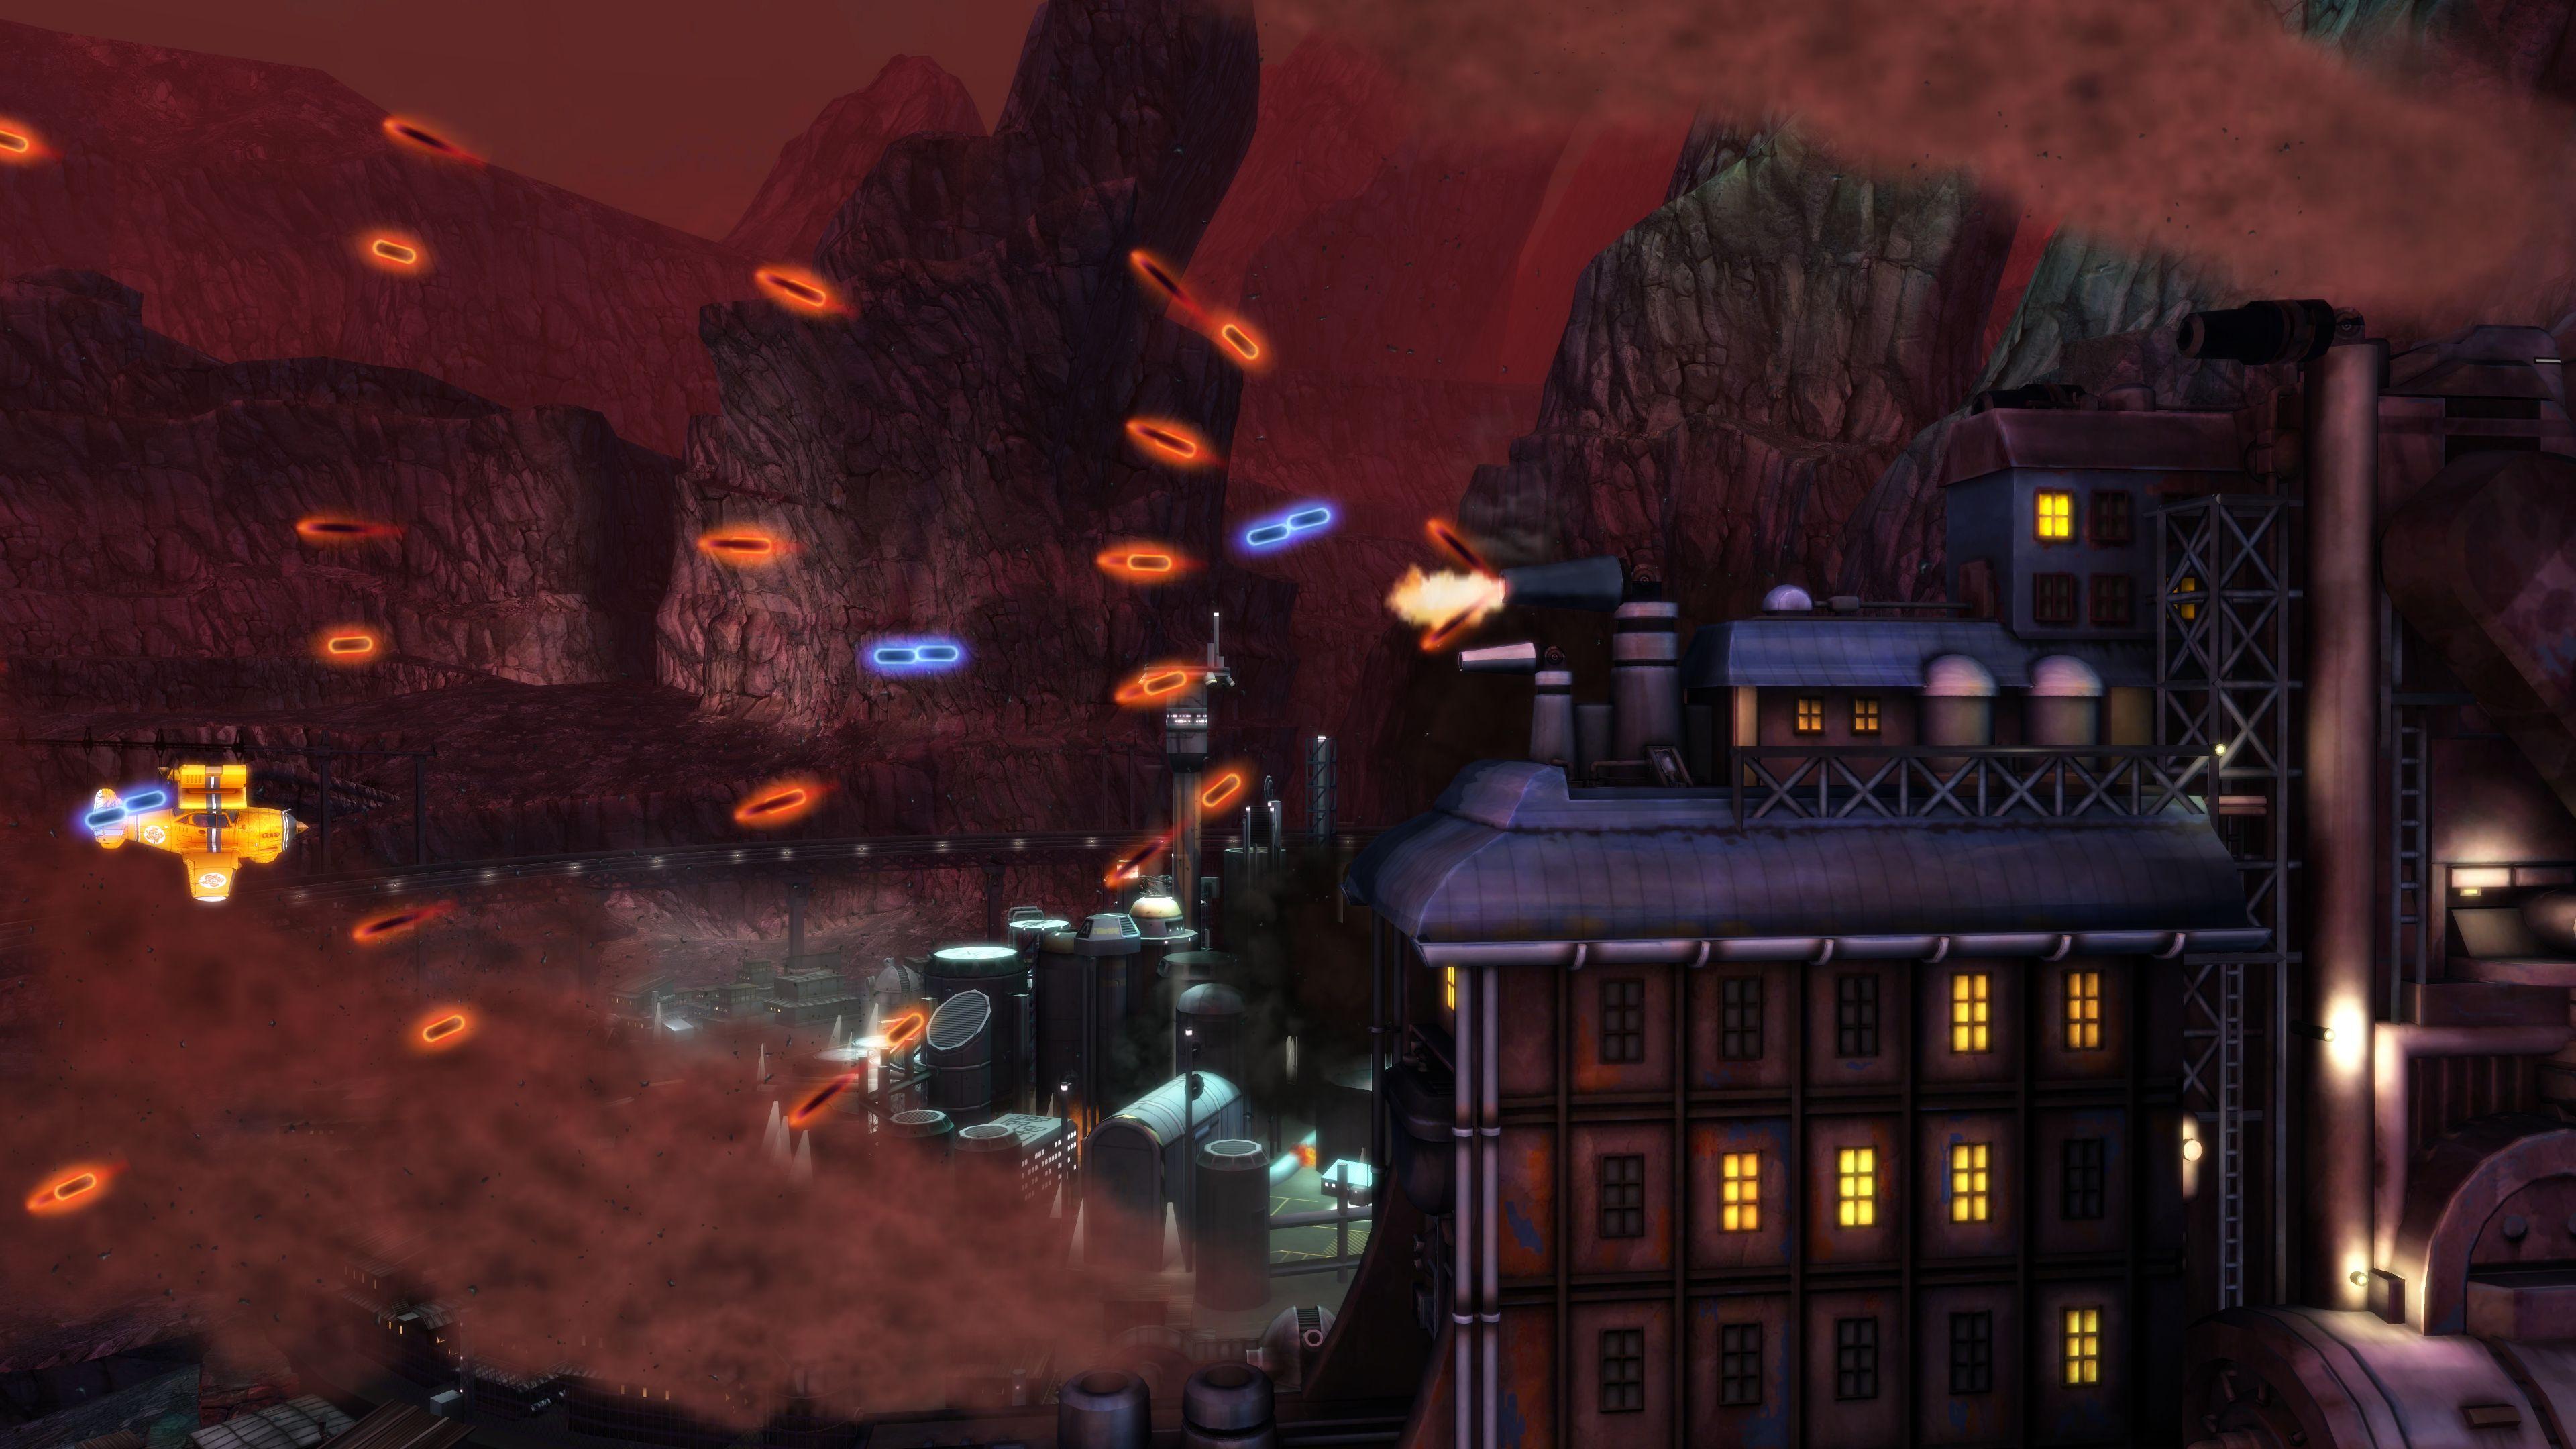 Hry pro Switch se rozrostou o Battle Chasers: Nightwar a Sine Mora EX 142162